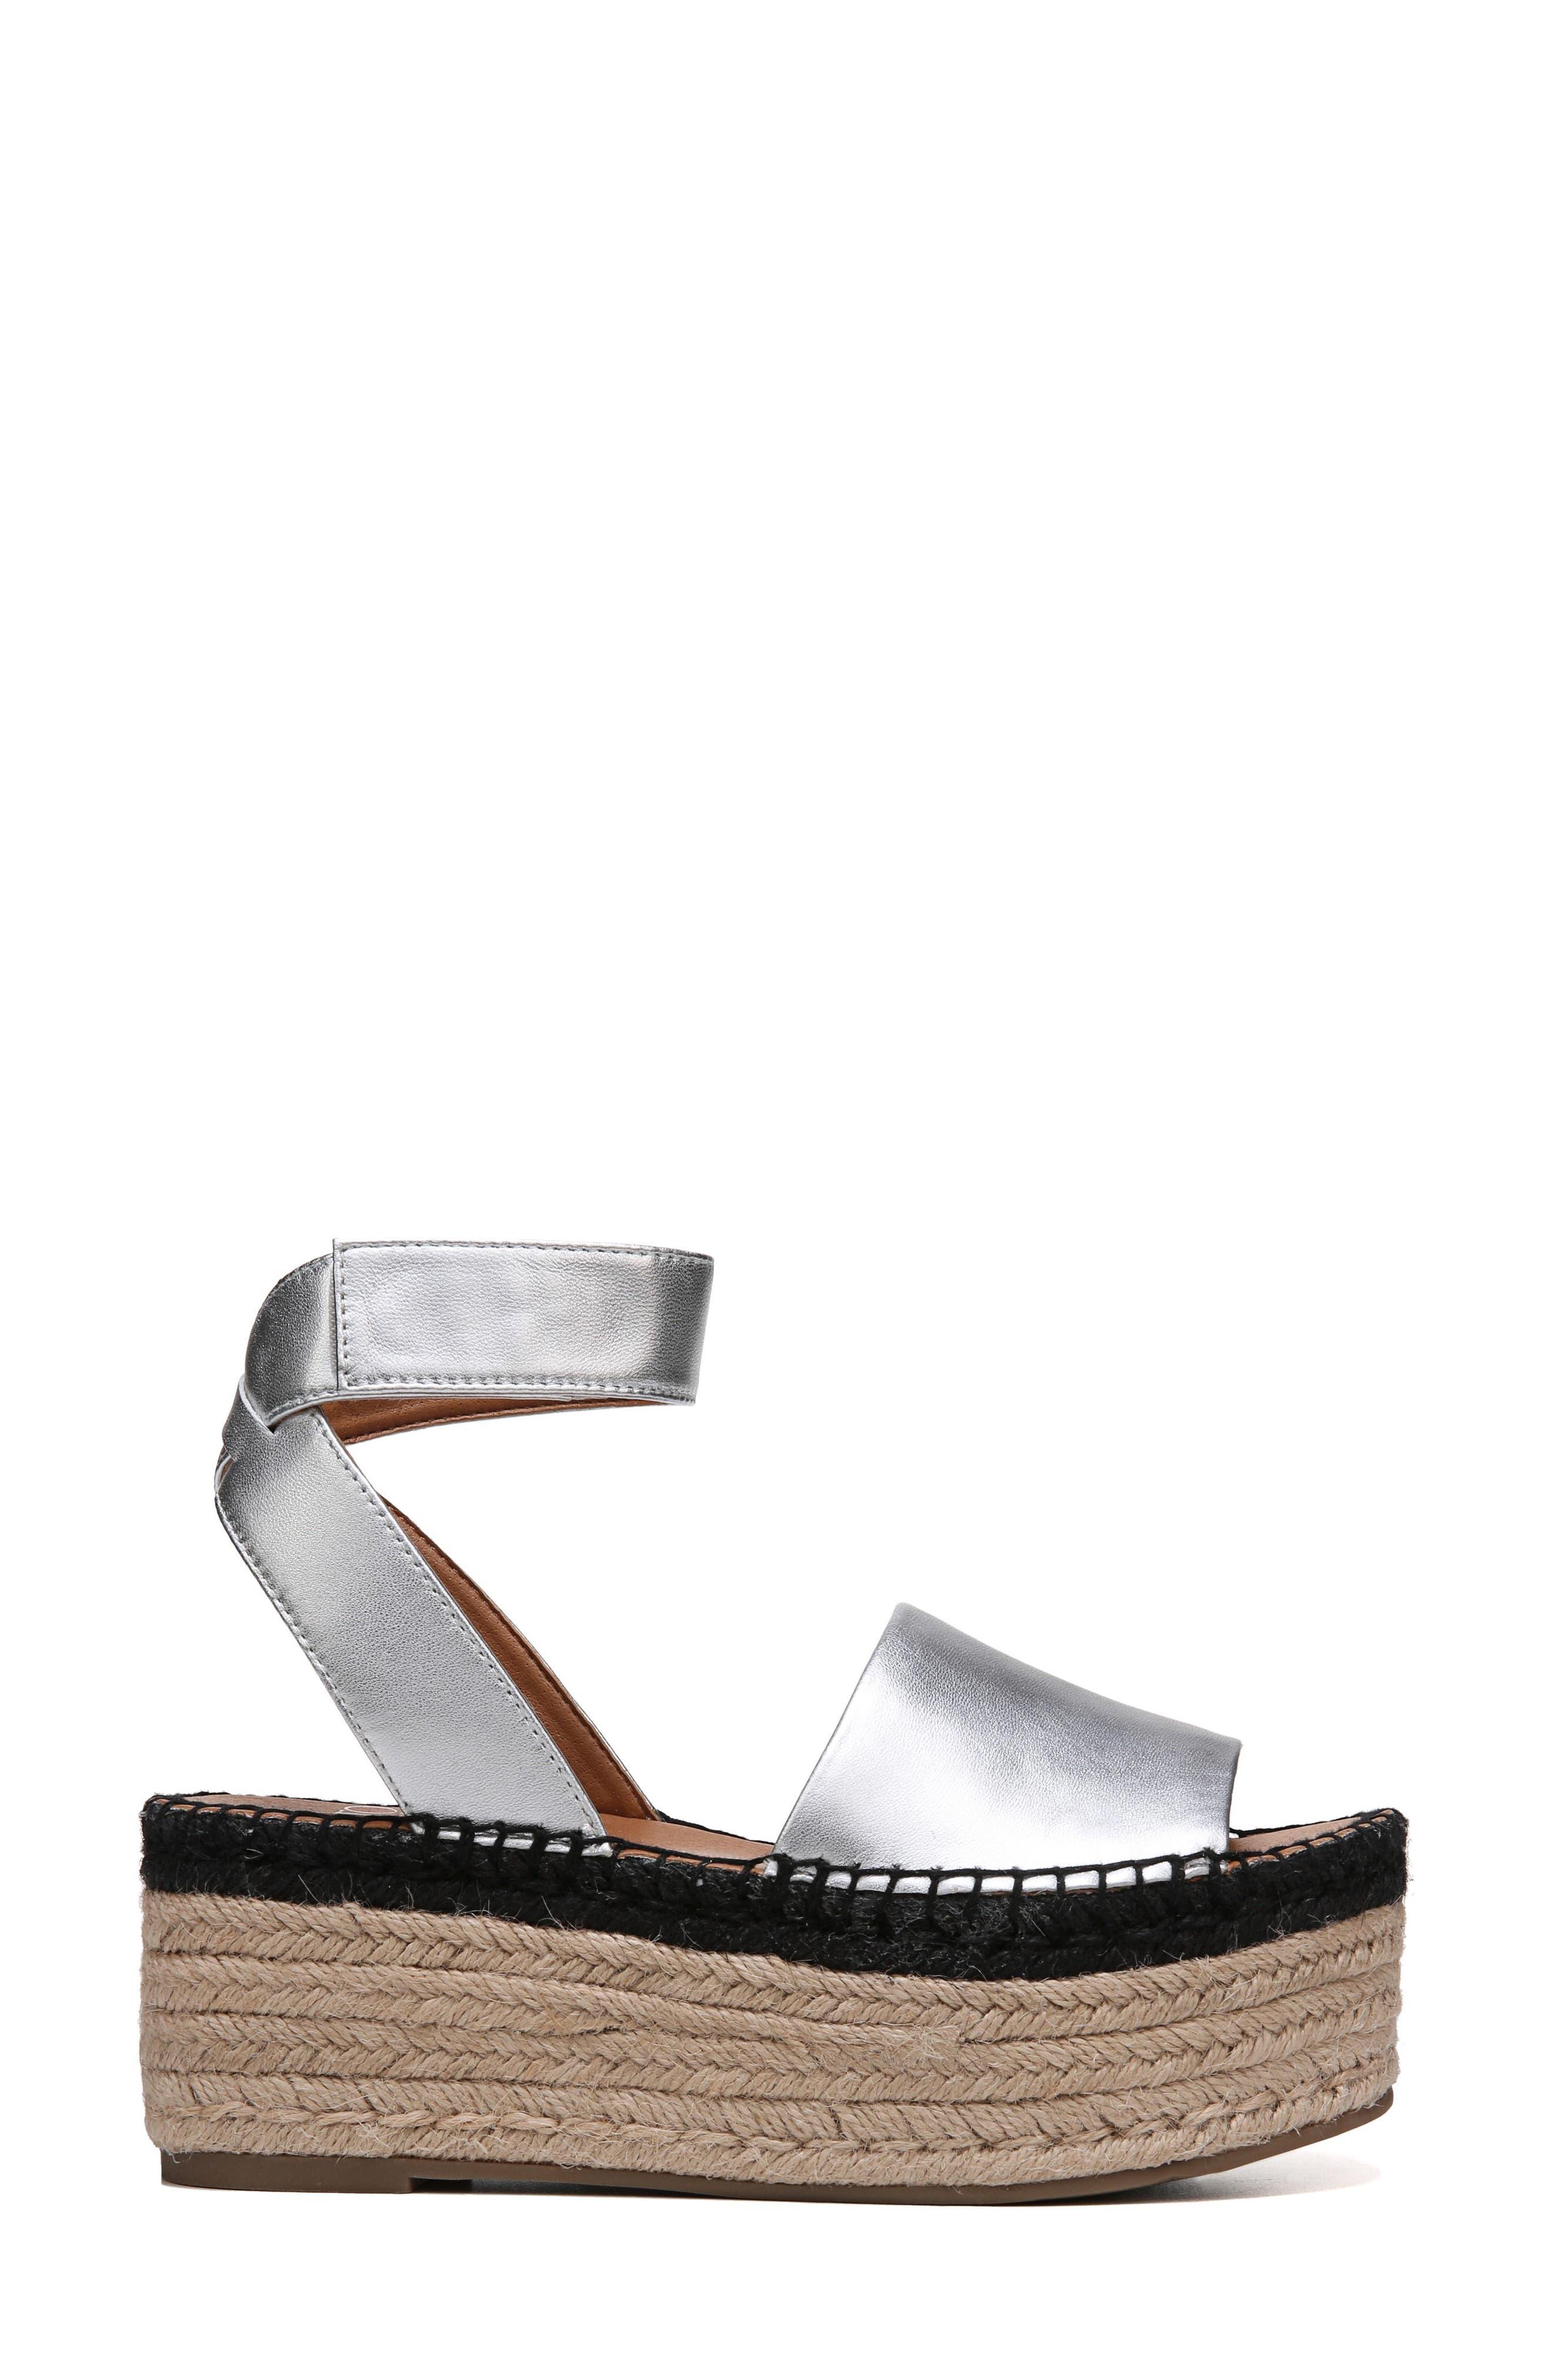 Maisi Platform Espadrille Sandal,                             Alternate thumbnail 3, color,                             Silver Leather